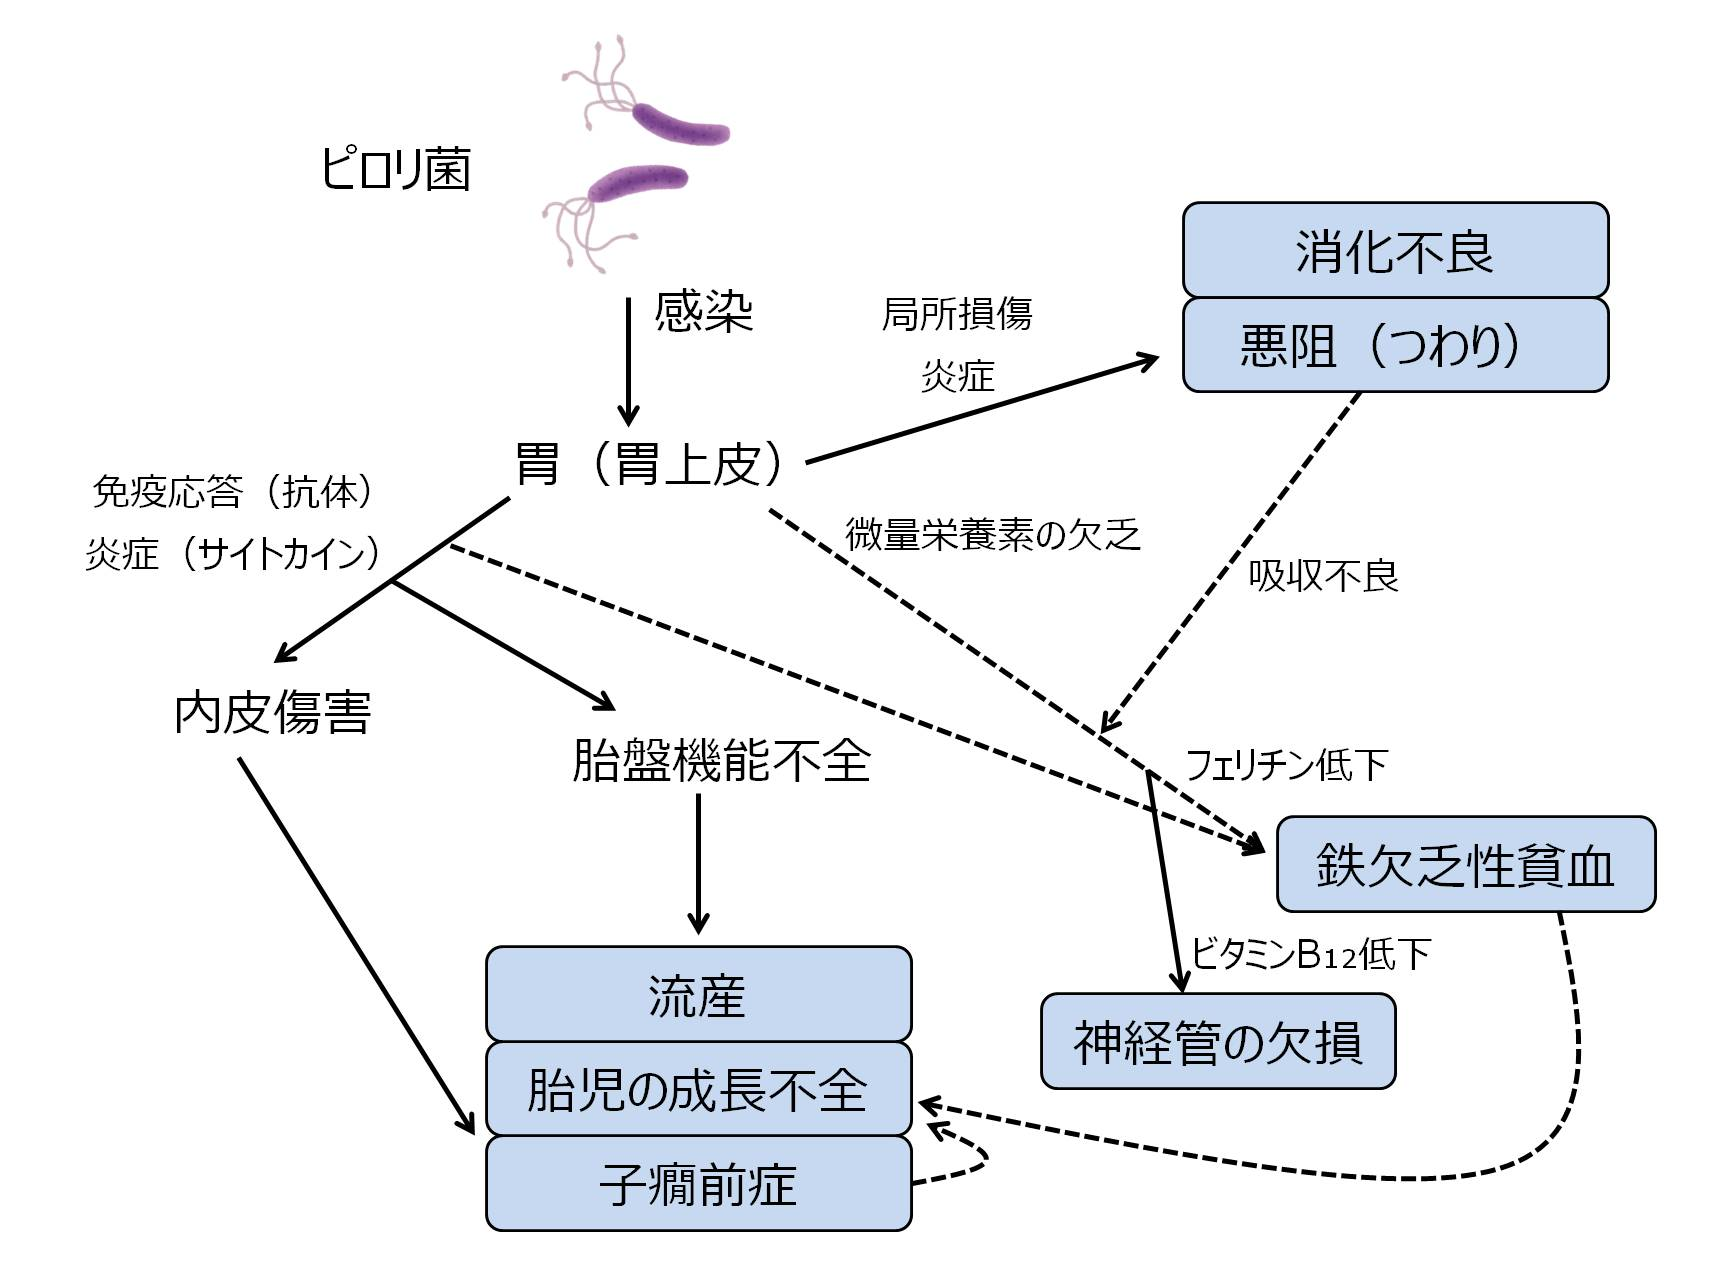 ピロリ菌 妊婦 妊娠 悪阻 流産 子癇前症 妊娠高血圧腎症